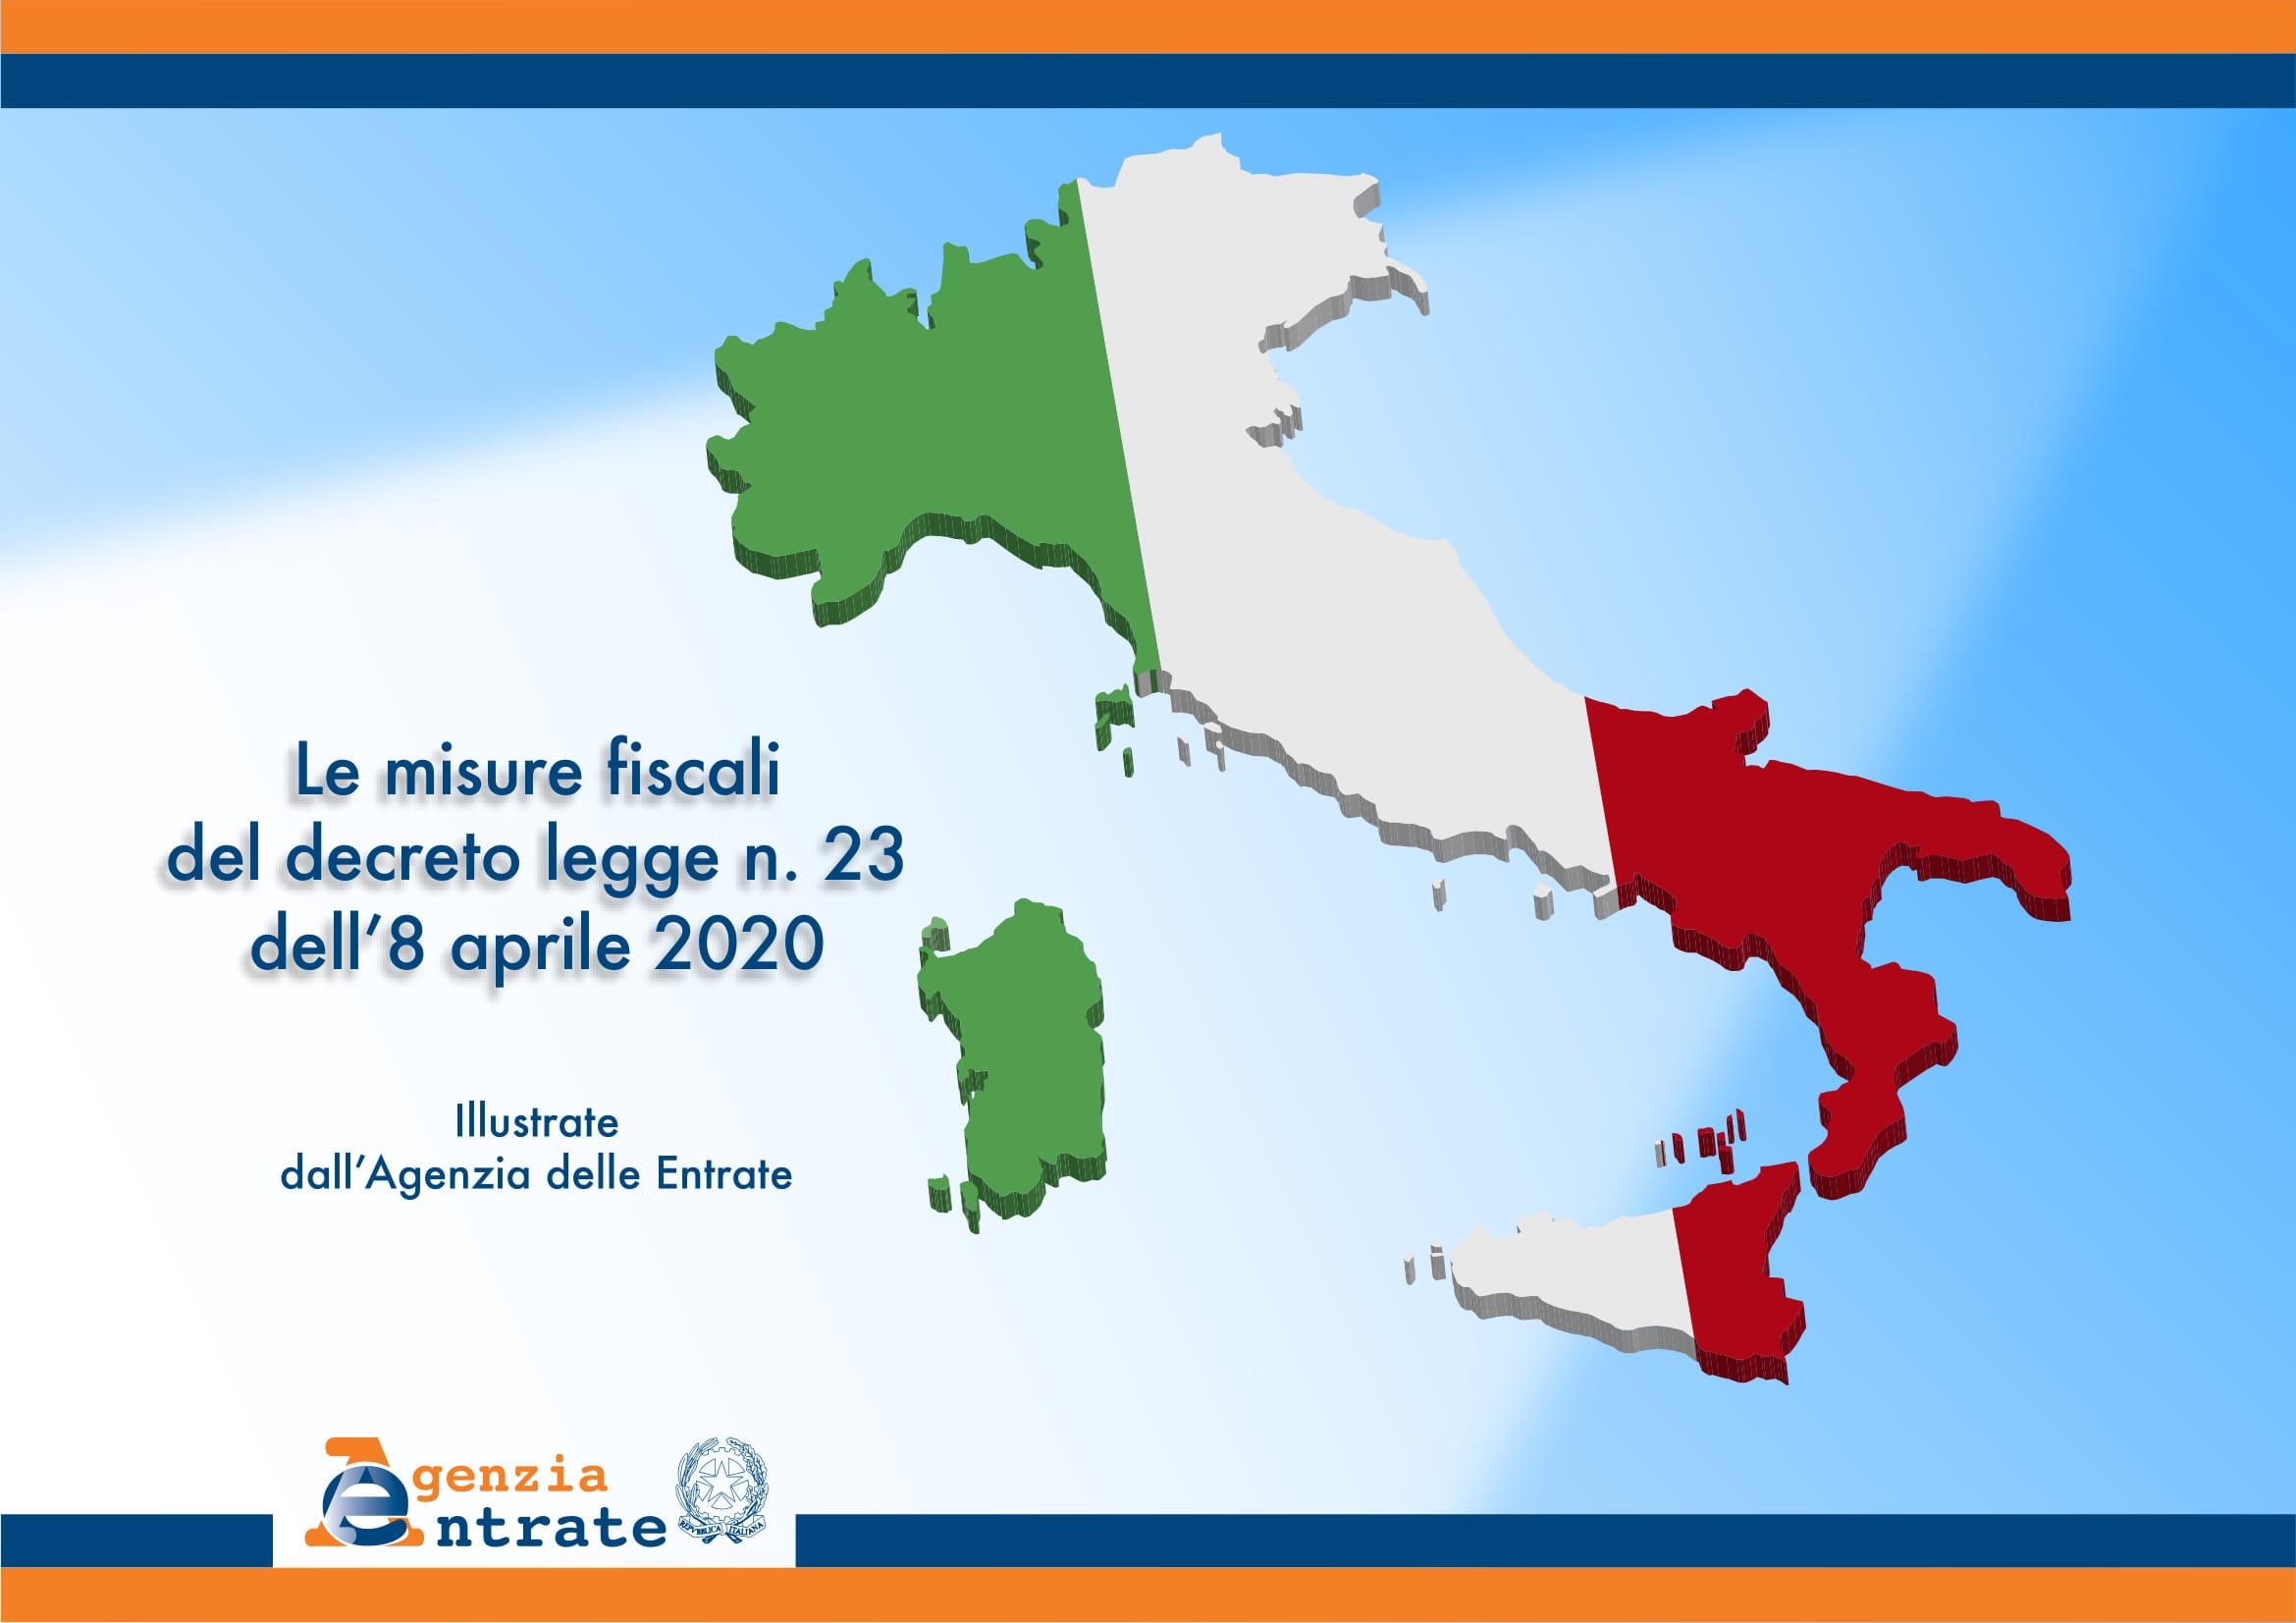 misure-fiscali-coronavirus-infografica-agenzia-entrate